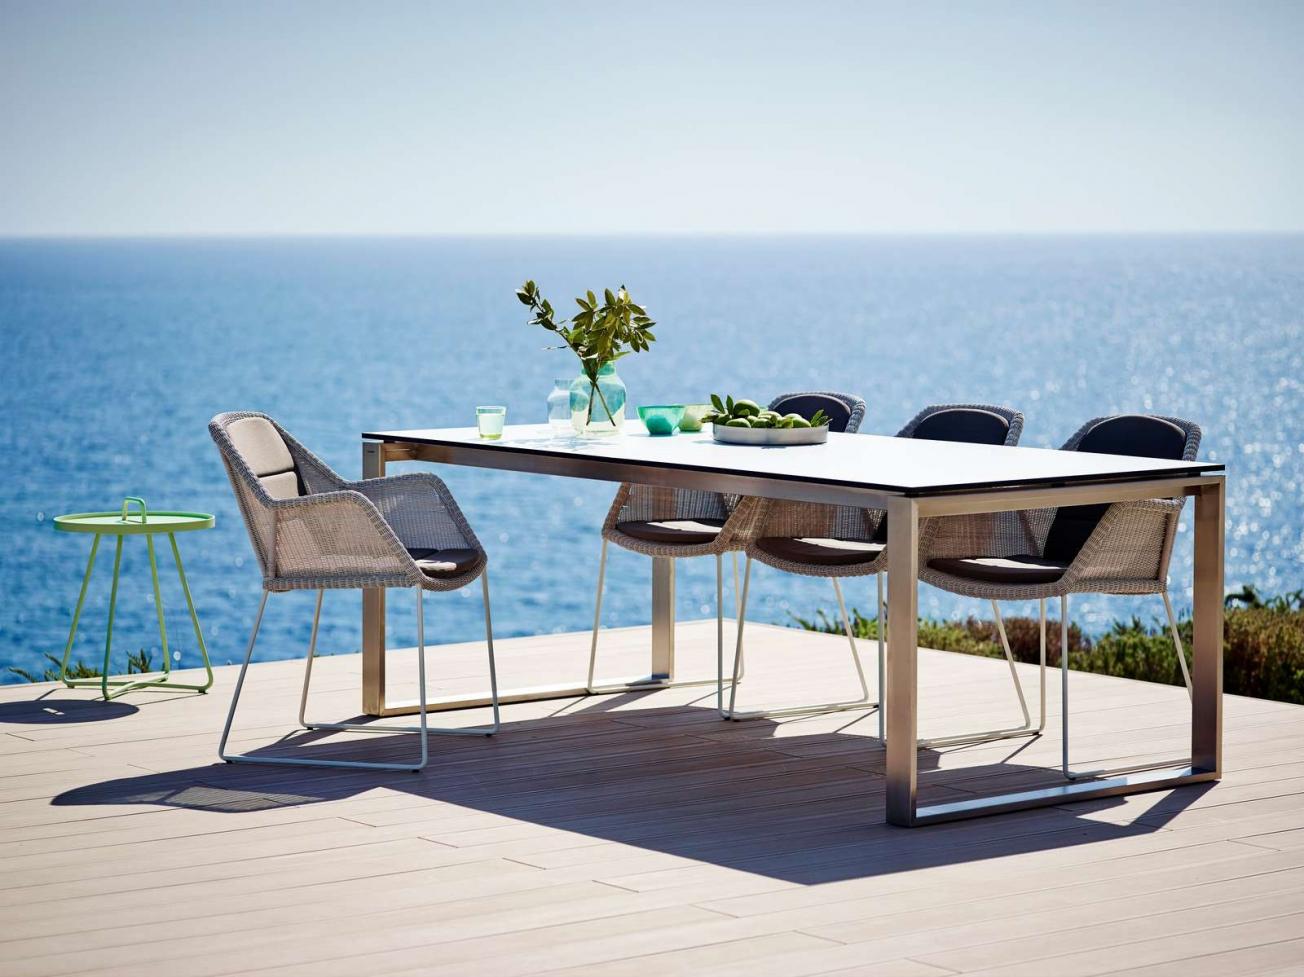 Breeze Outdoor Dining Chair 187 Iq Outdoor Living